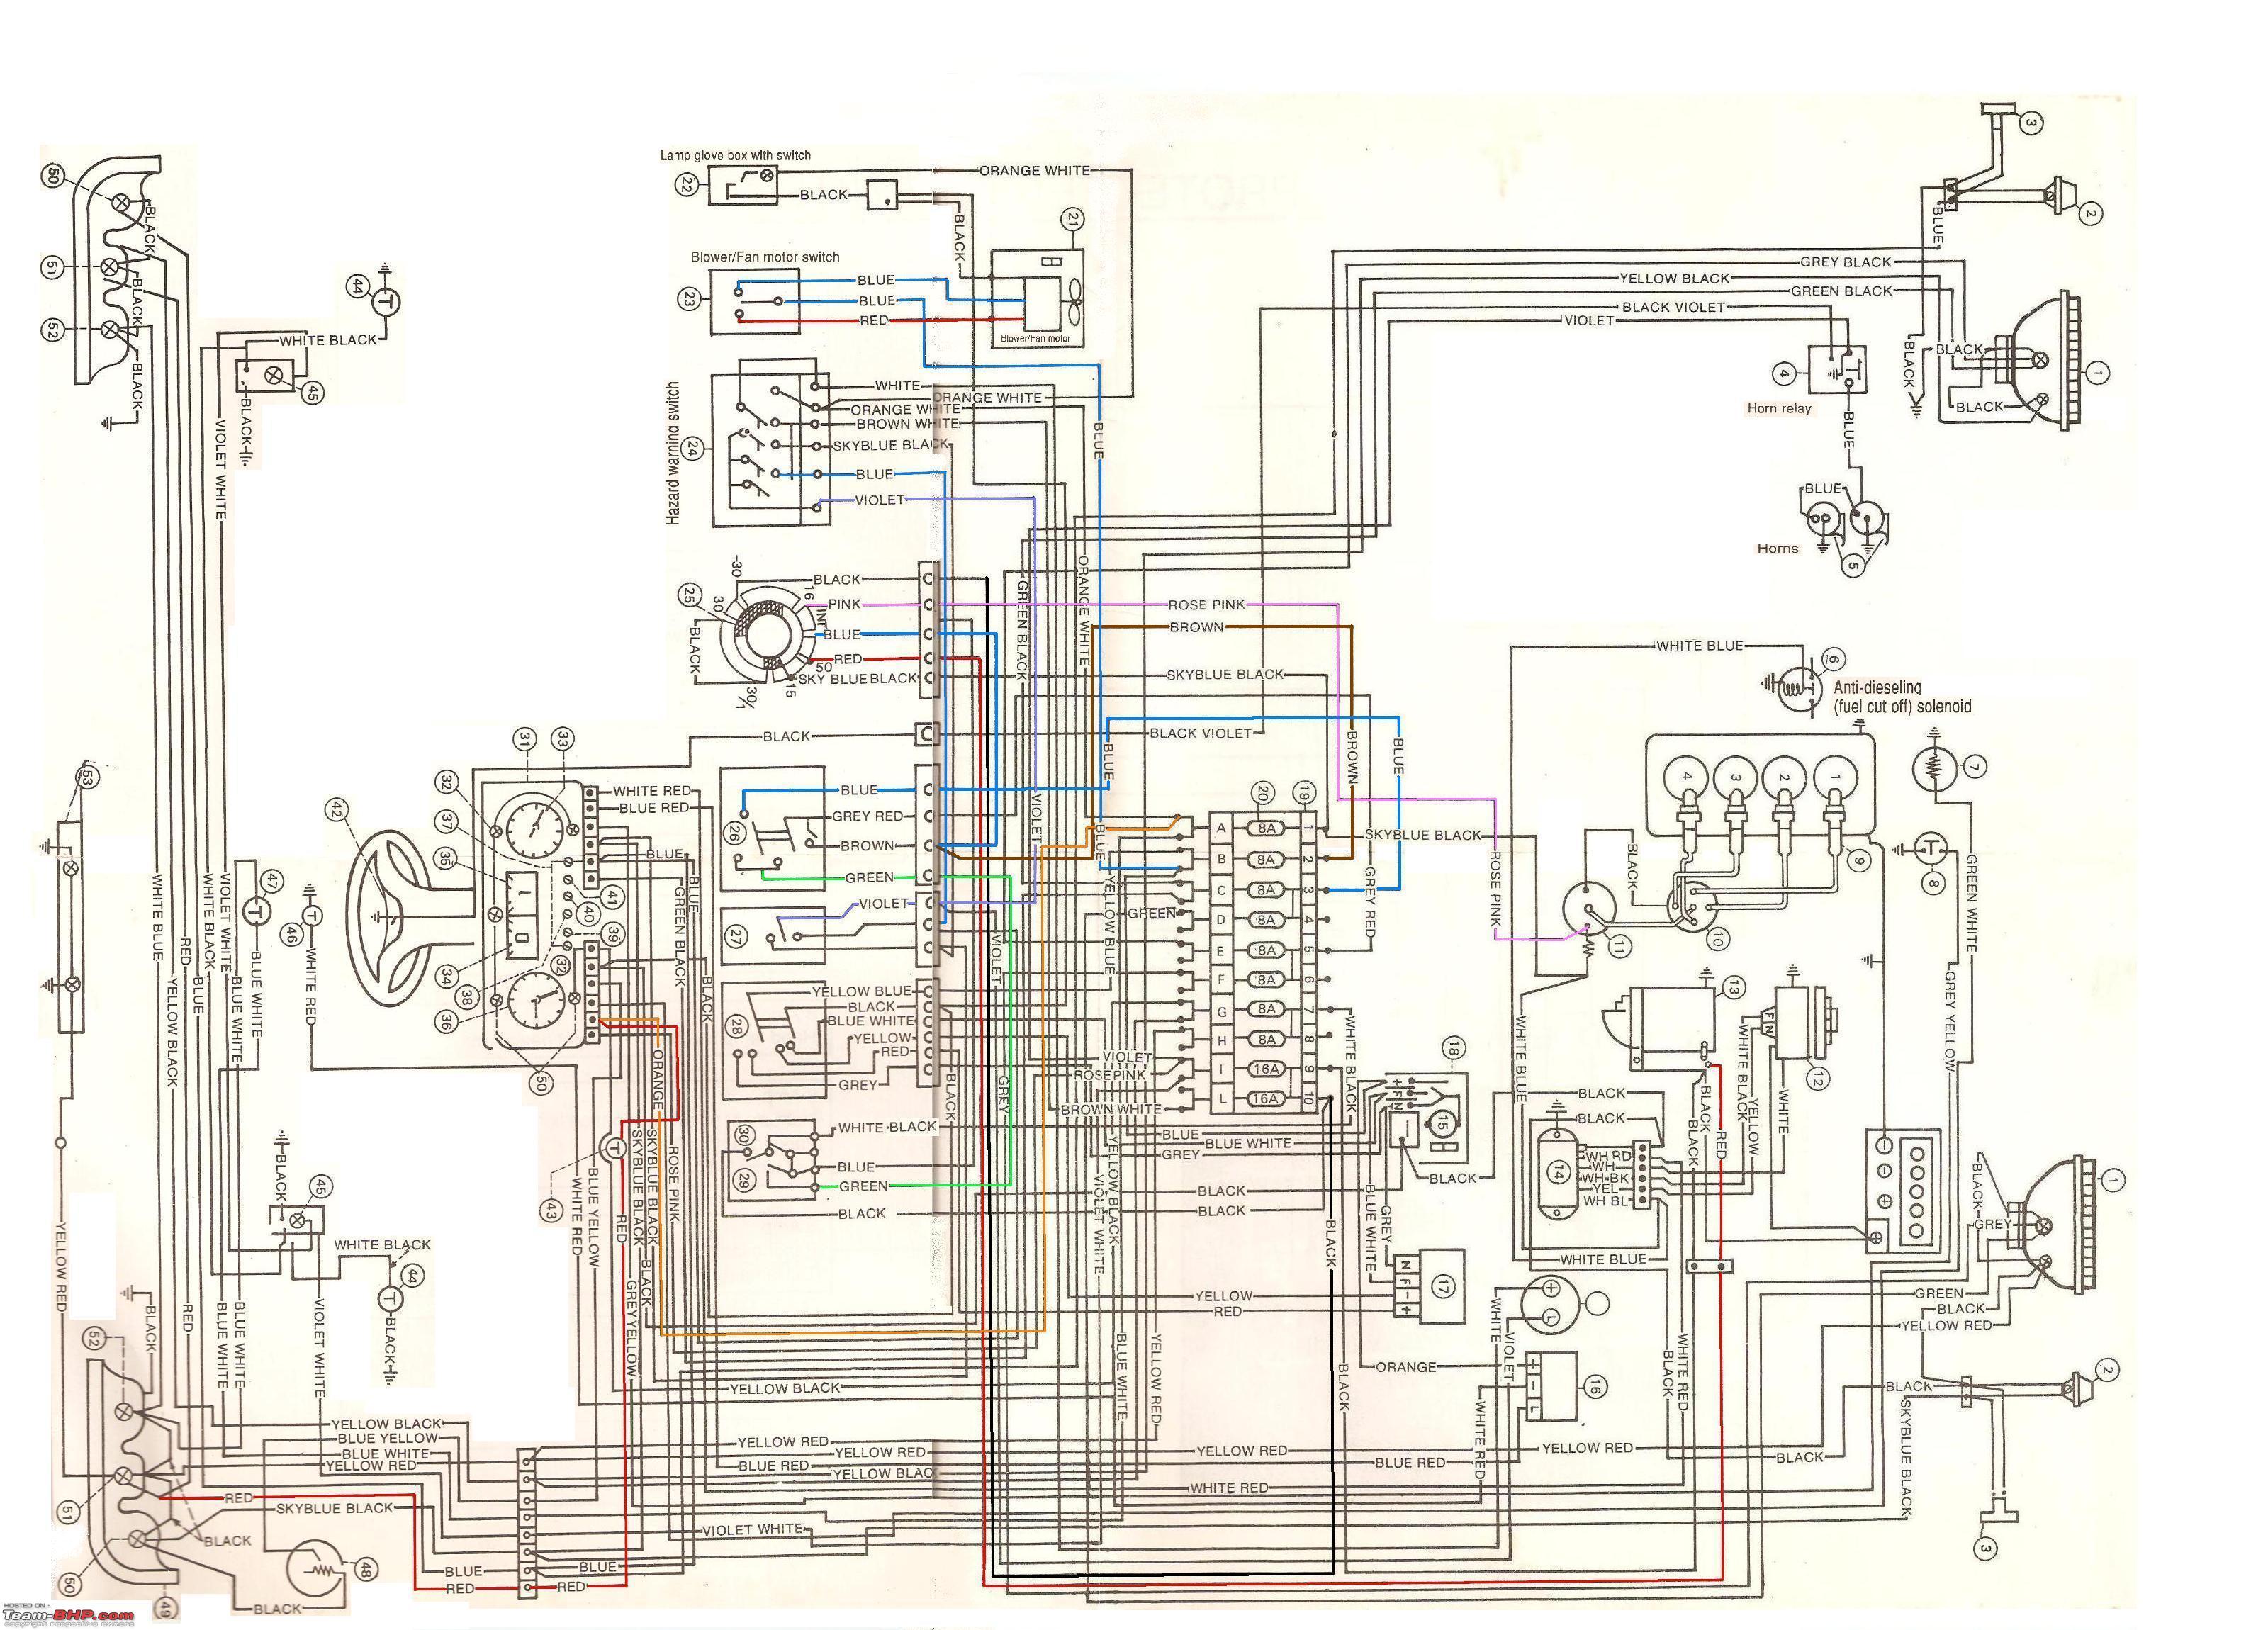 Suzuki Gz 250 Wiring Diagram And Schematics Vz800 Gz250 Marauder Cyclepedia Printed Service Manual Source Astonishing Images Best Image